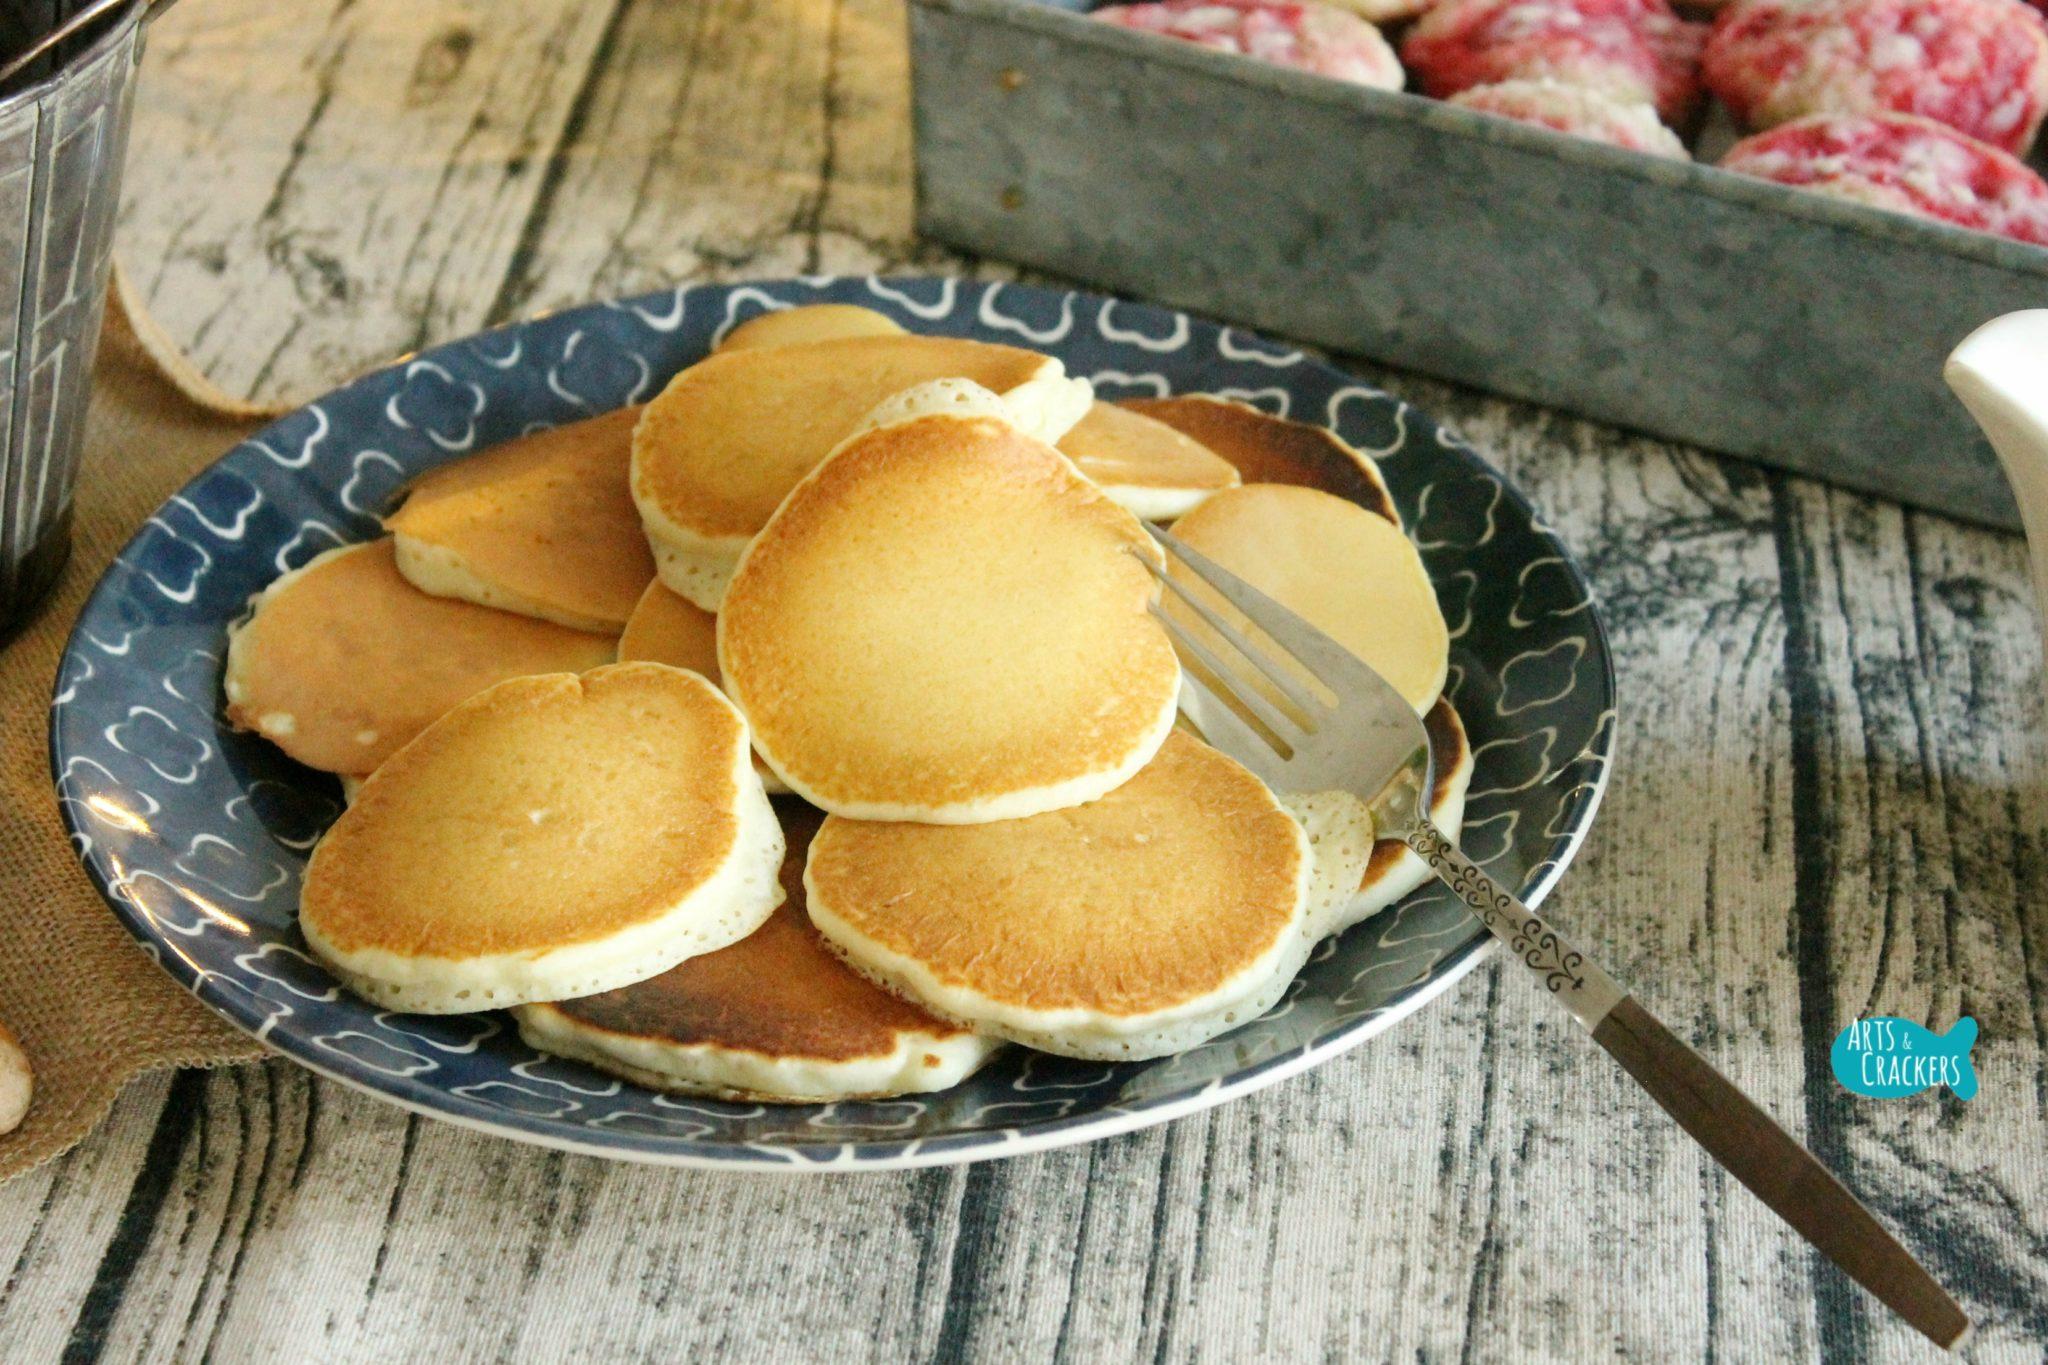 Farmhouse Breakfast Party Theme and Menu Ideas